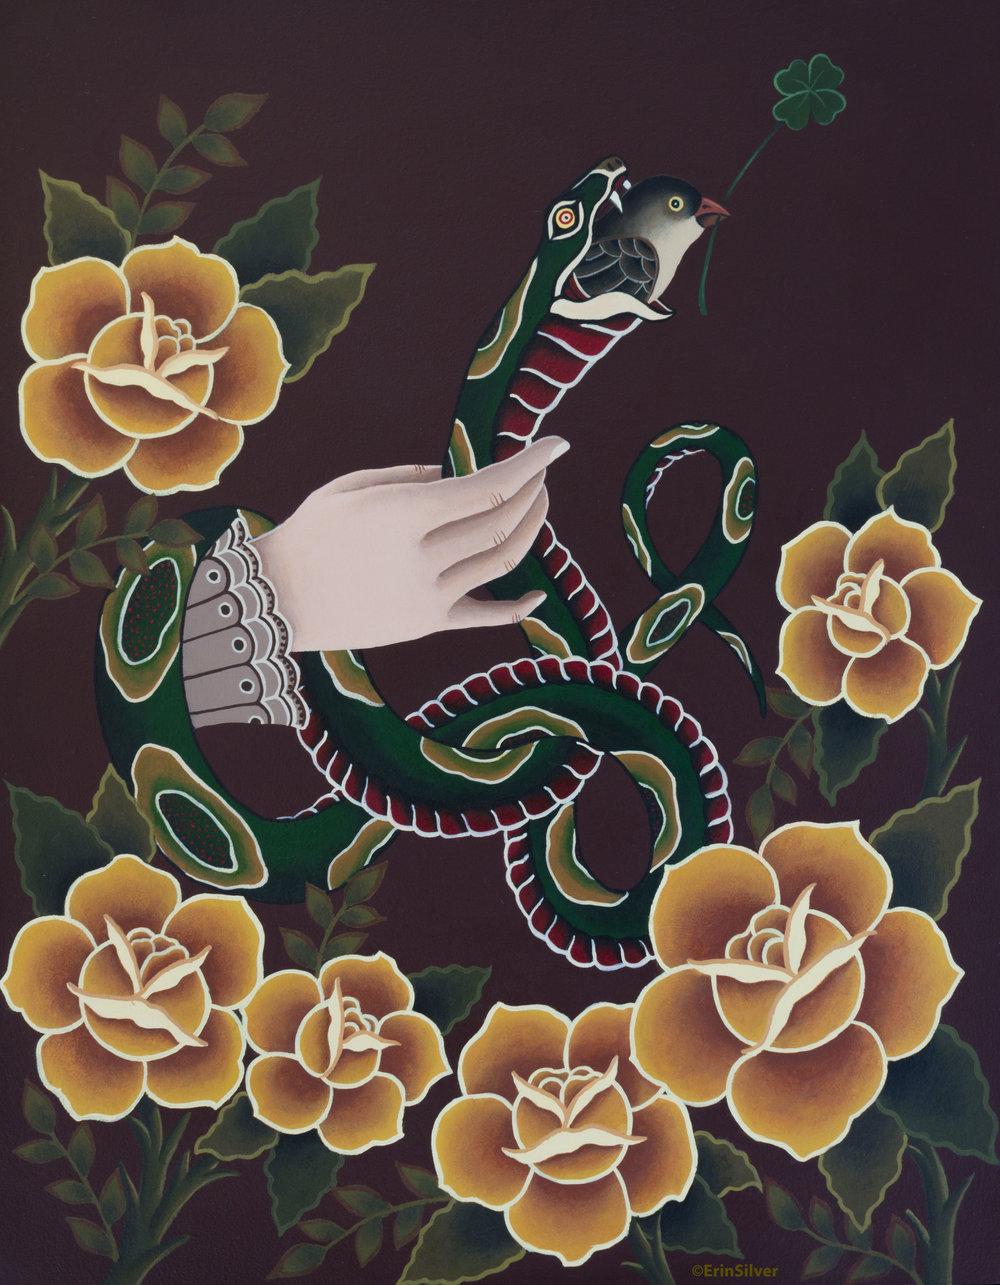 snakeymcsnakeface.jpg